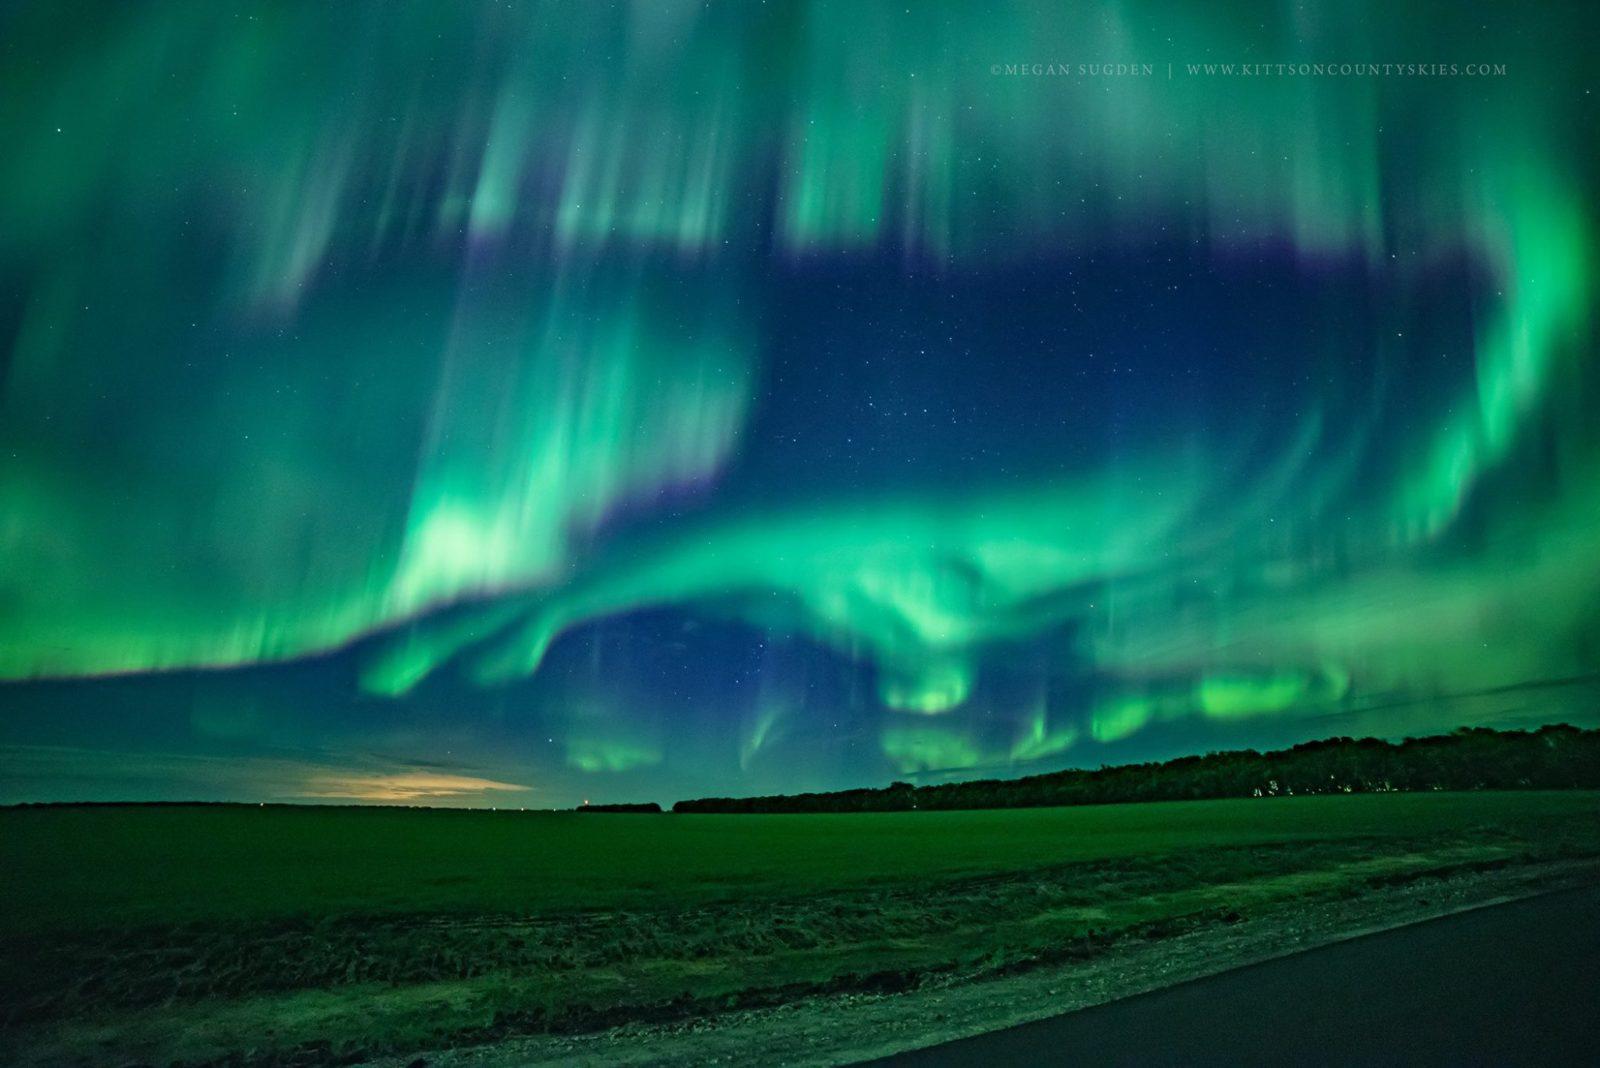 https://meganphoto.com/lights/